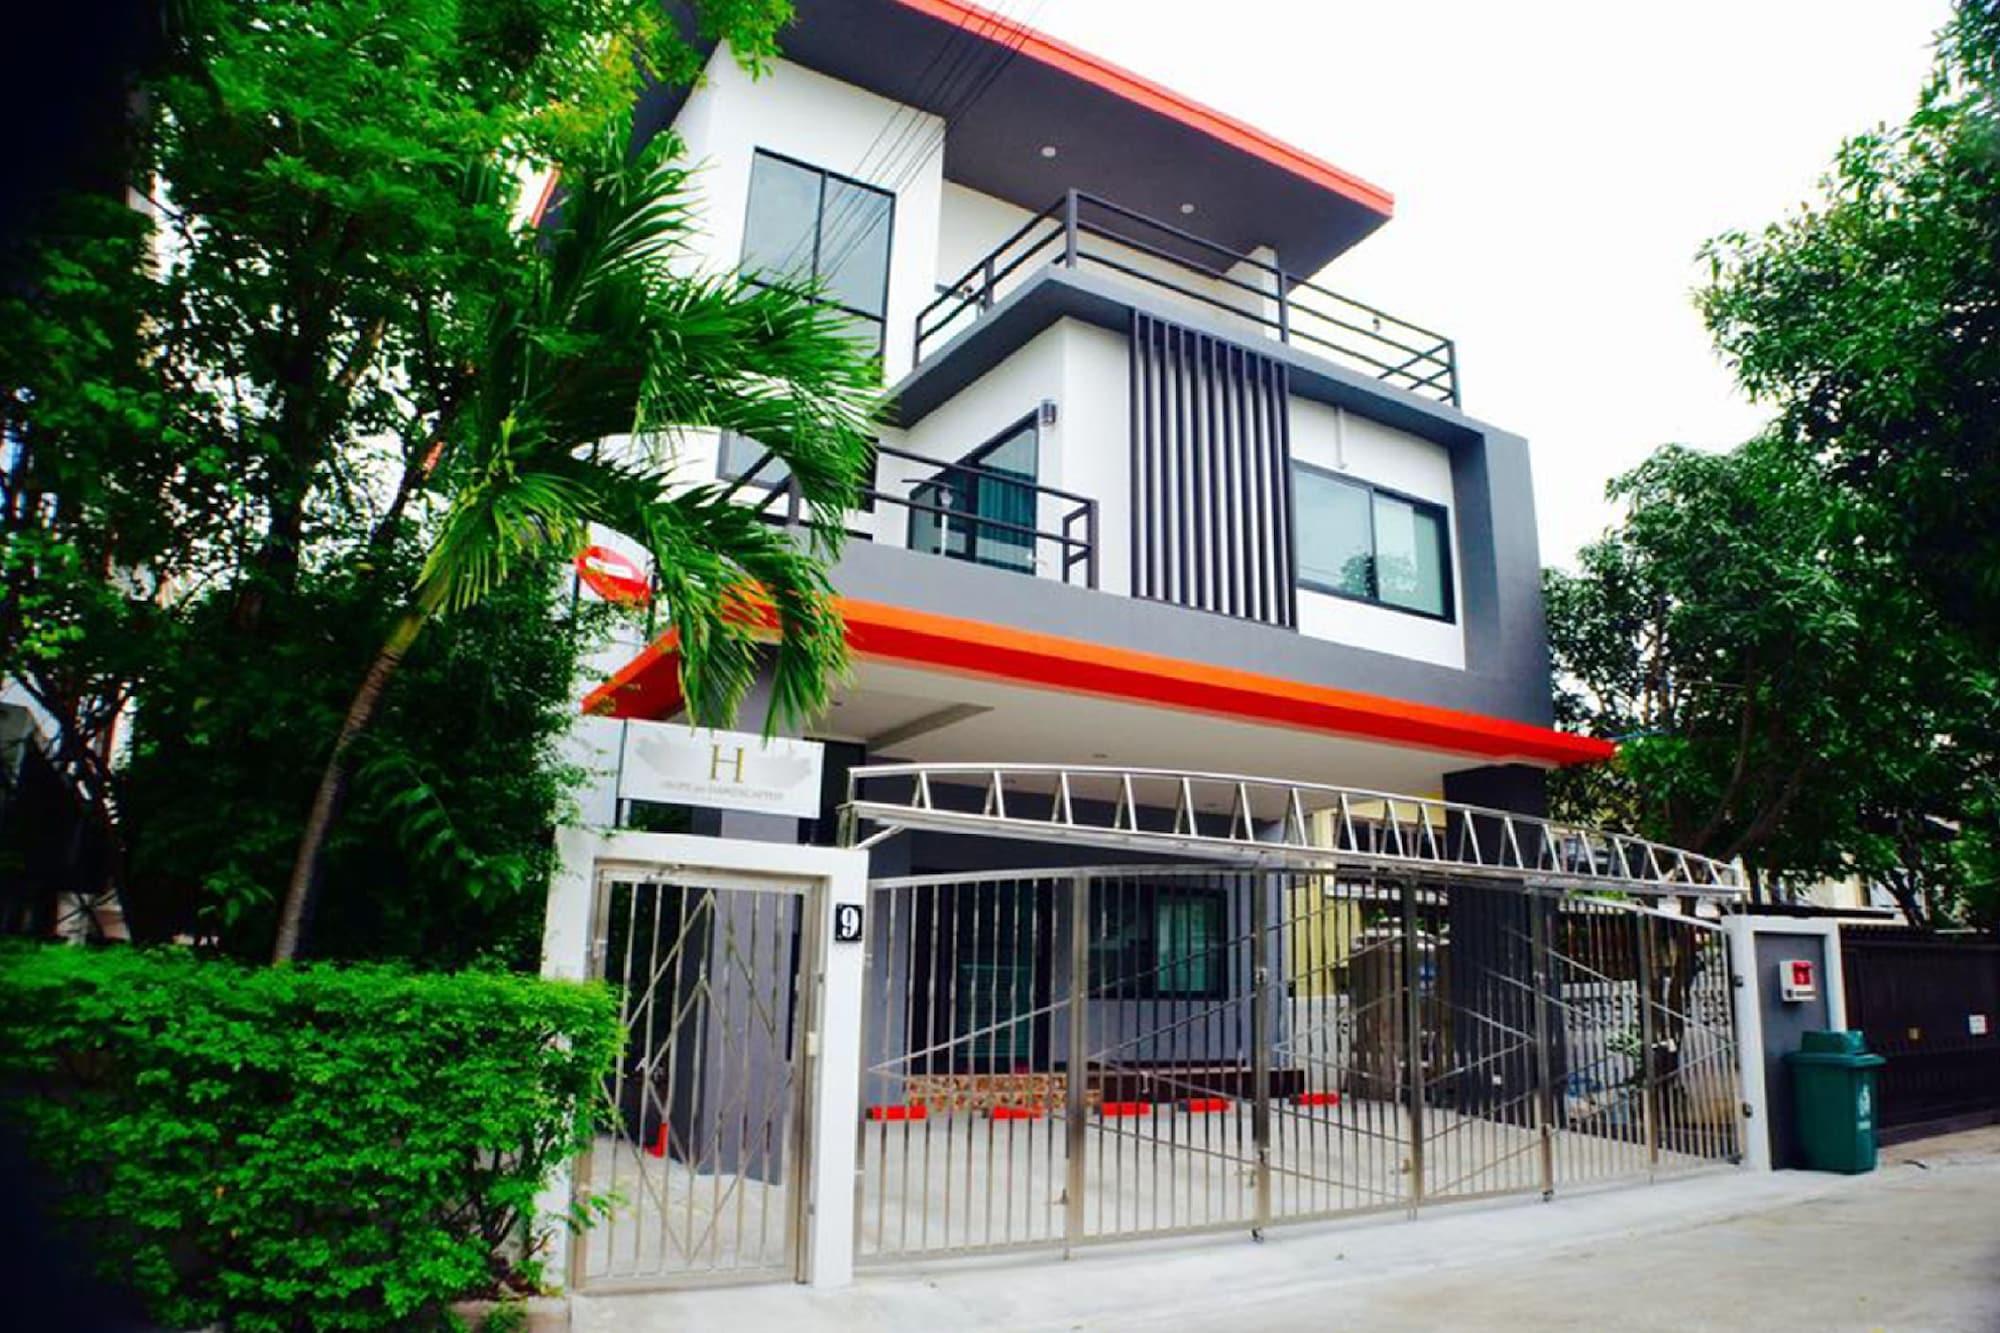 4 Bedroom House @Skytrain, Bang Na